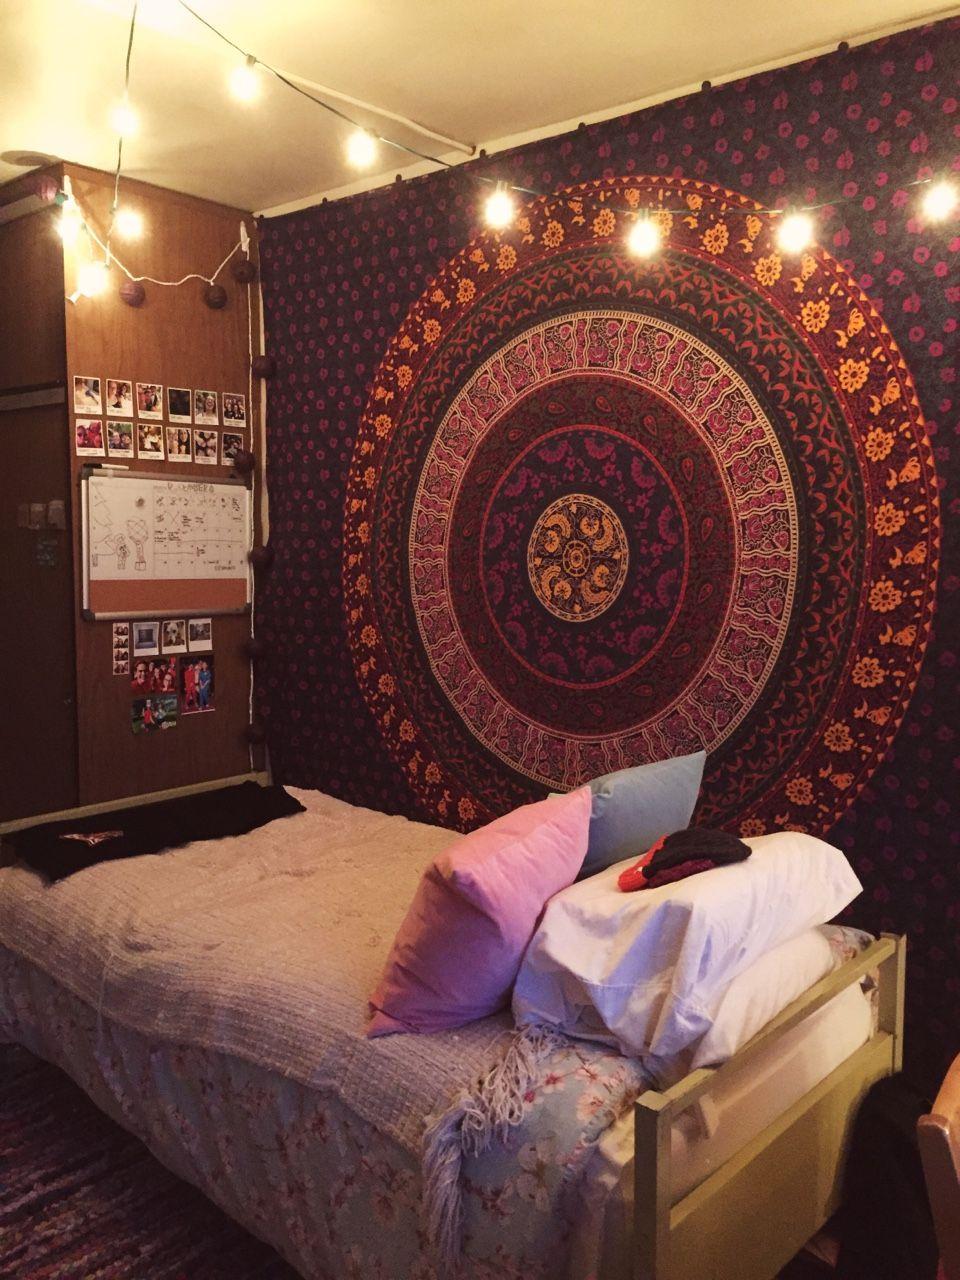 ... Backdrop Medallion Yoga Meditation Picnic Garden Beach Throw Boho Gypsy  Dorm Decor Living Room Hippie Hippy Wall Hanging Tapestry These Wonderful  Prints ... Part 48